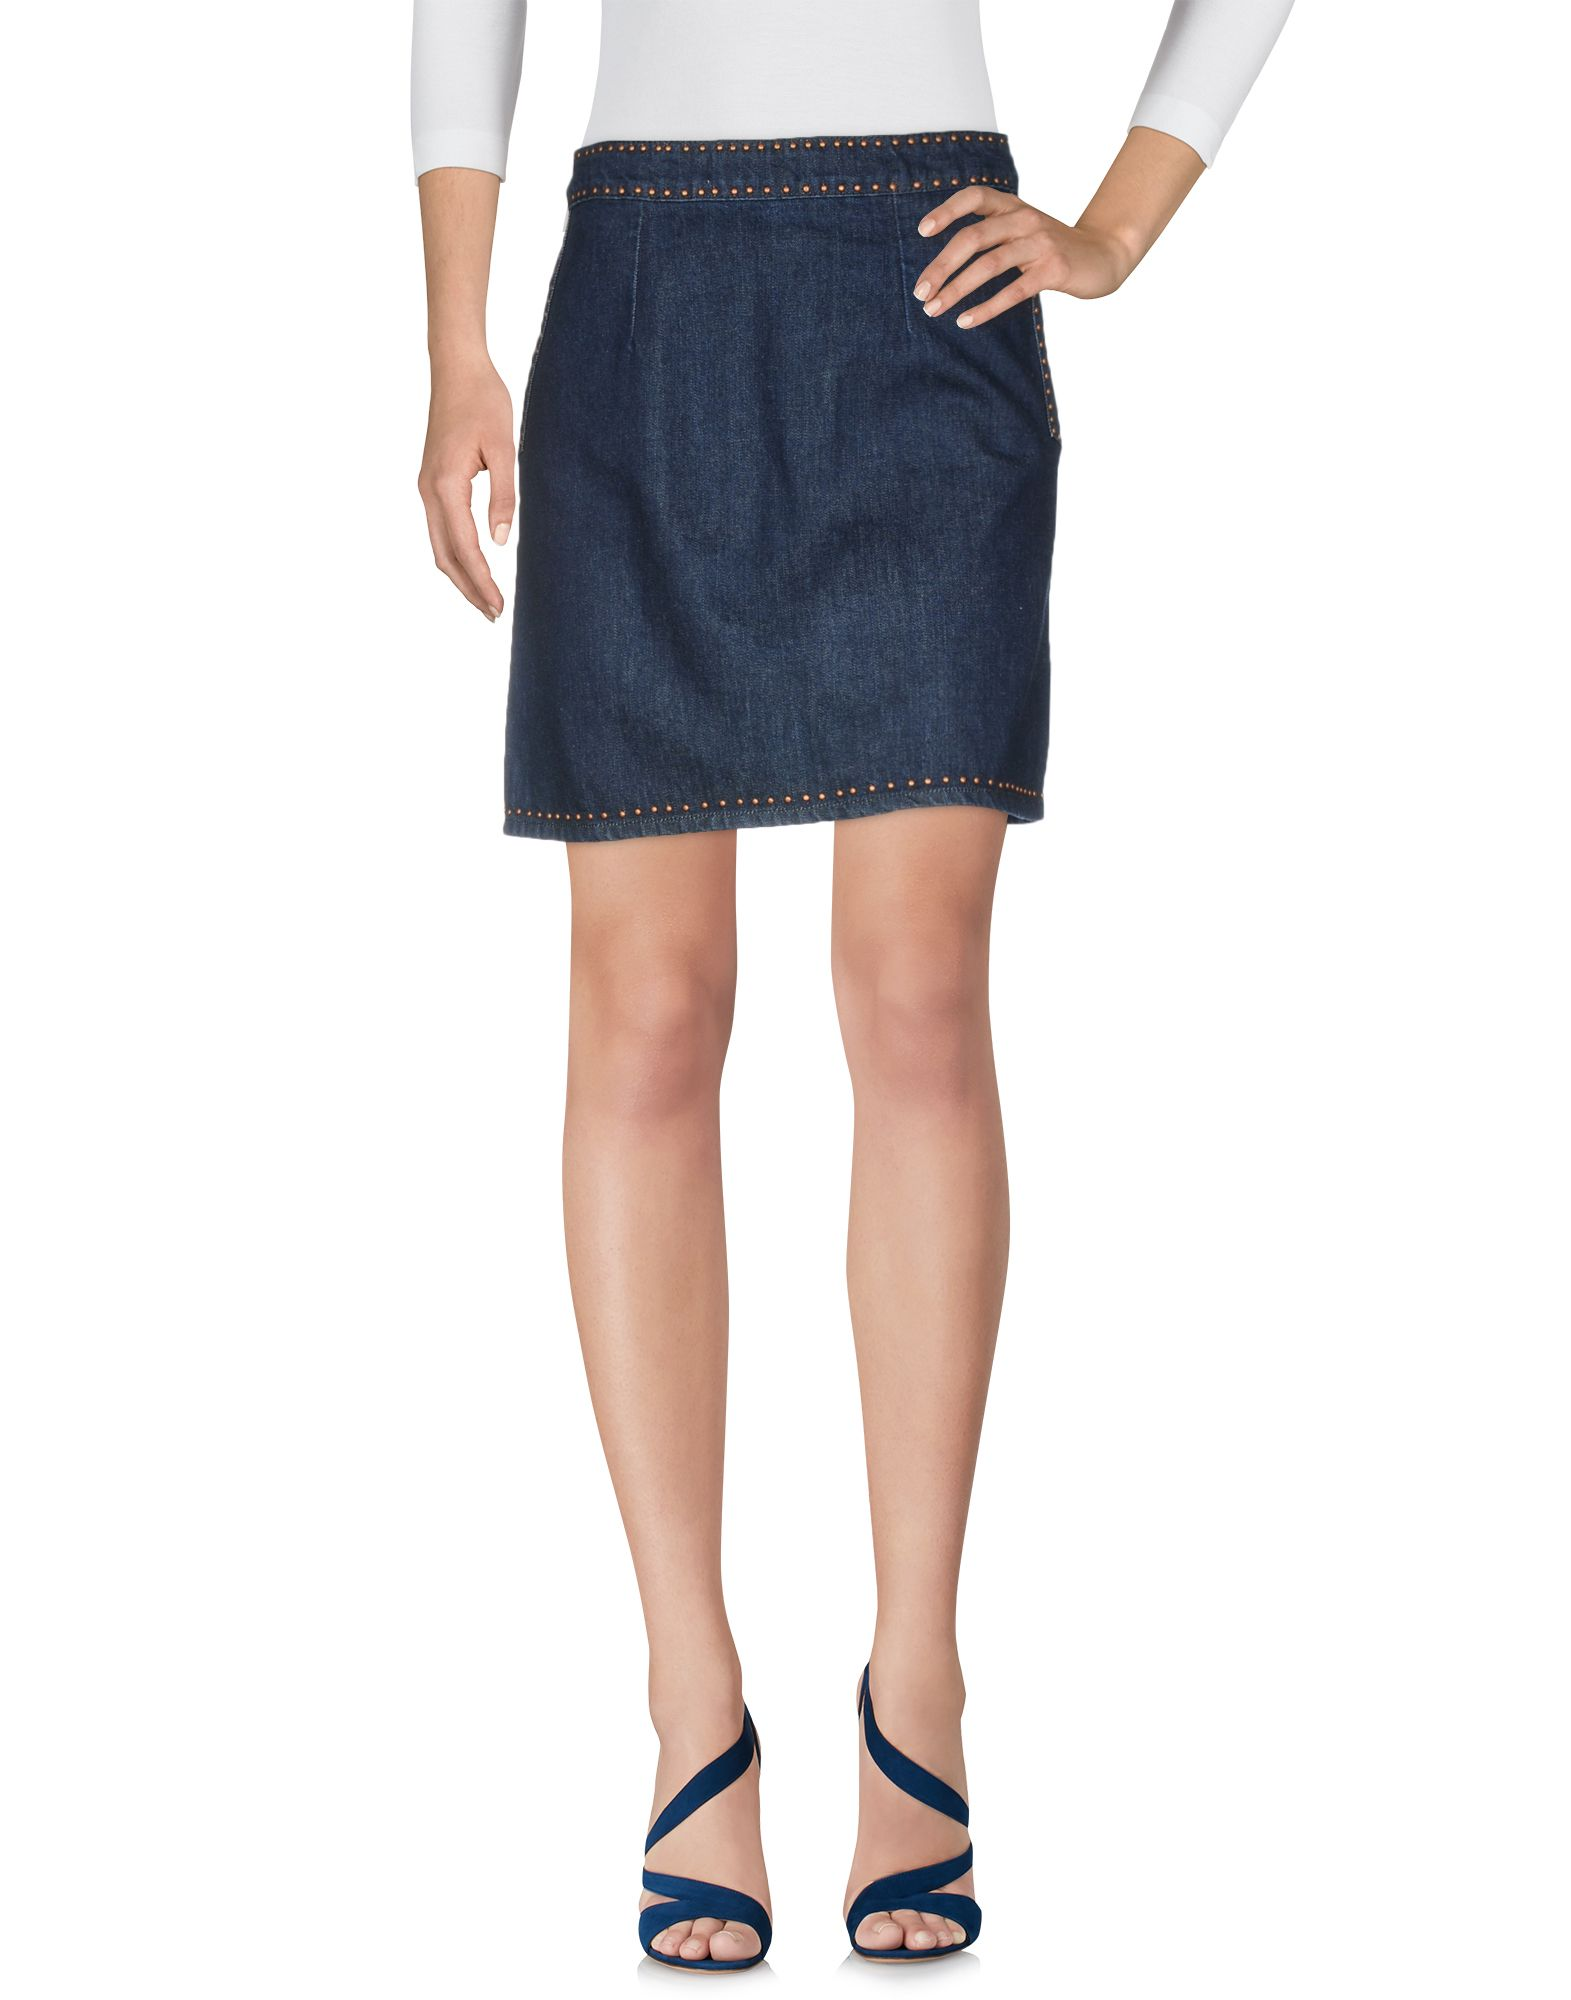 SANDRO Джинсовая юбка sandro джинсовая юбка с декоративной шнуровкой page 3